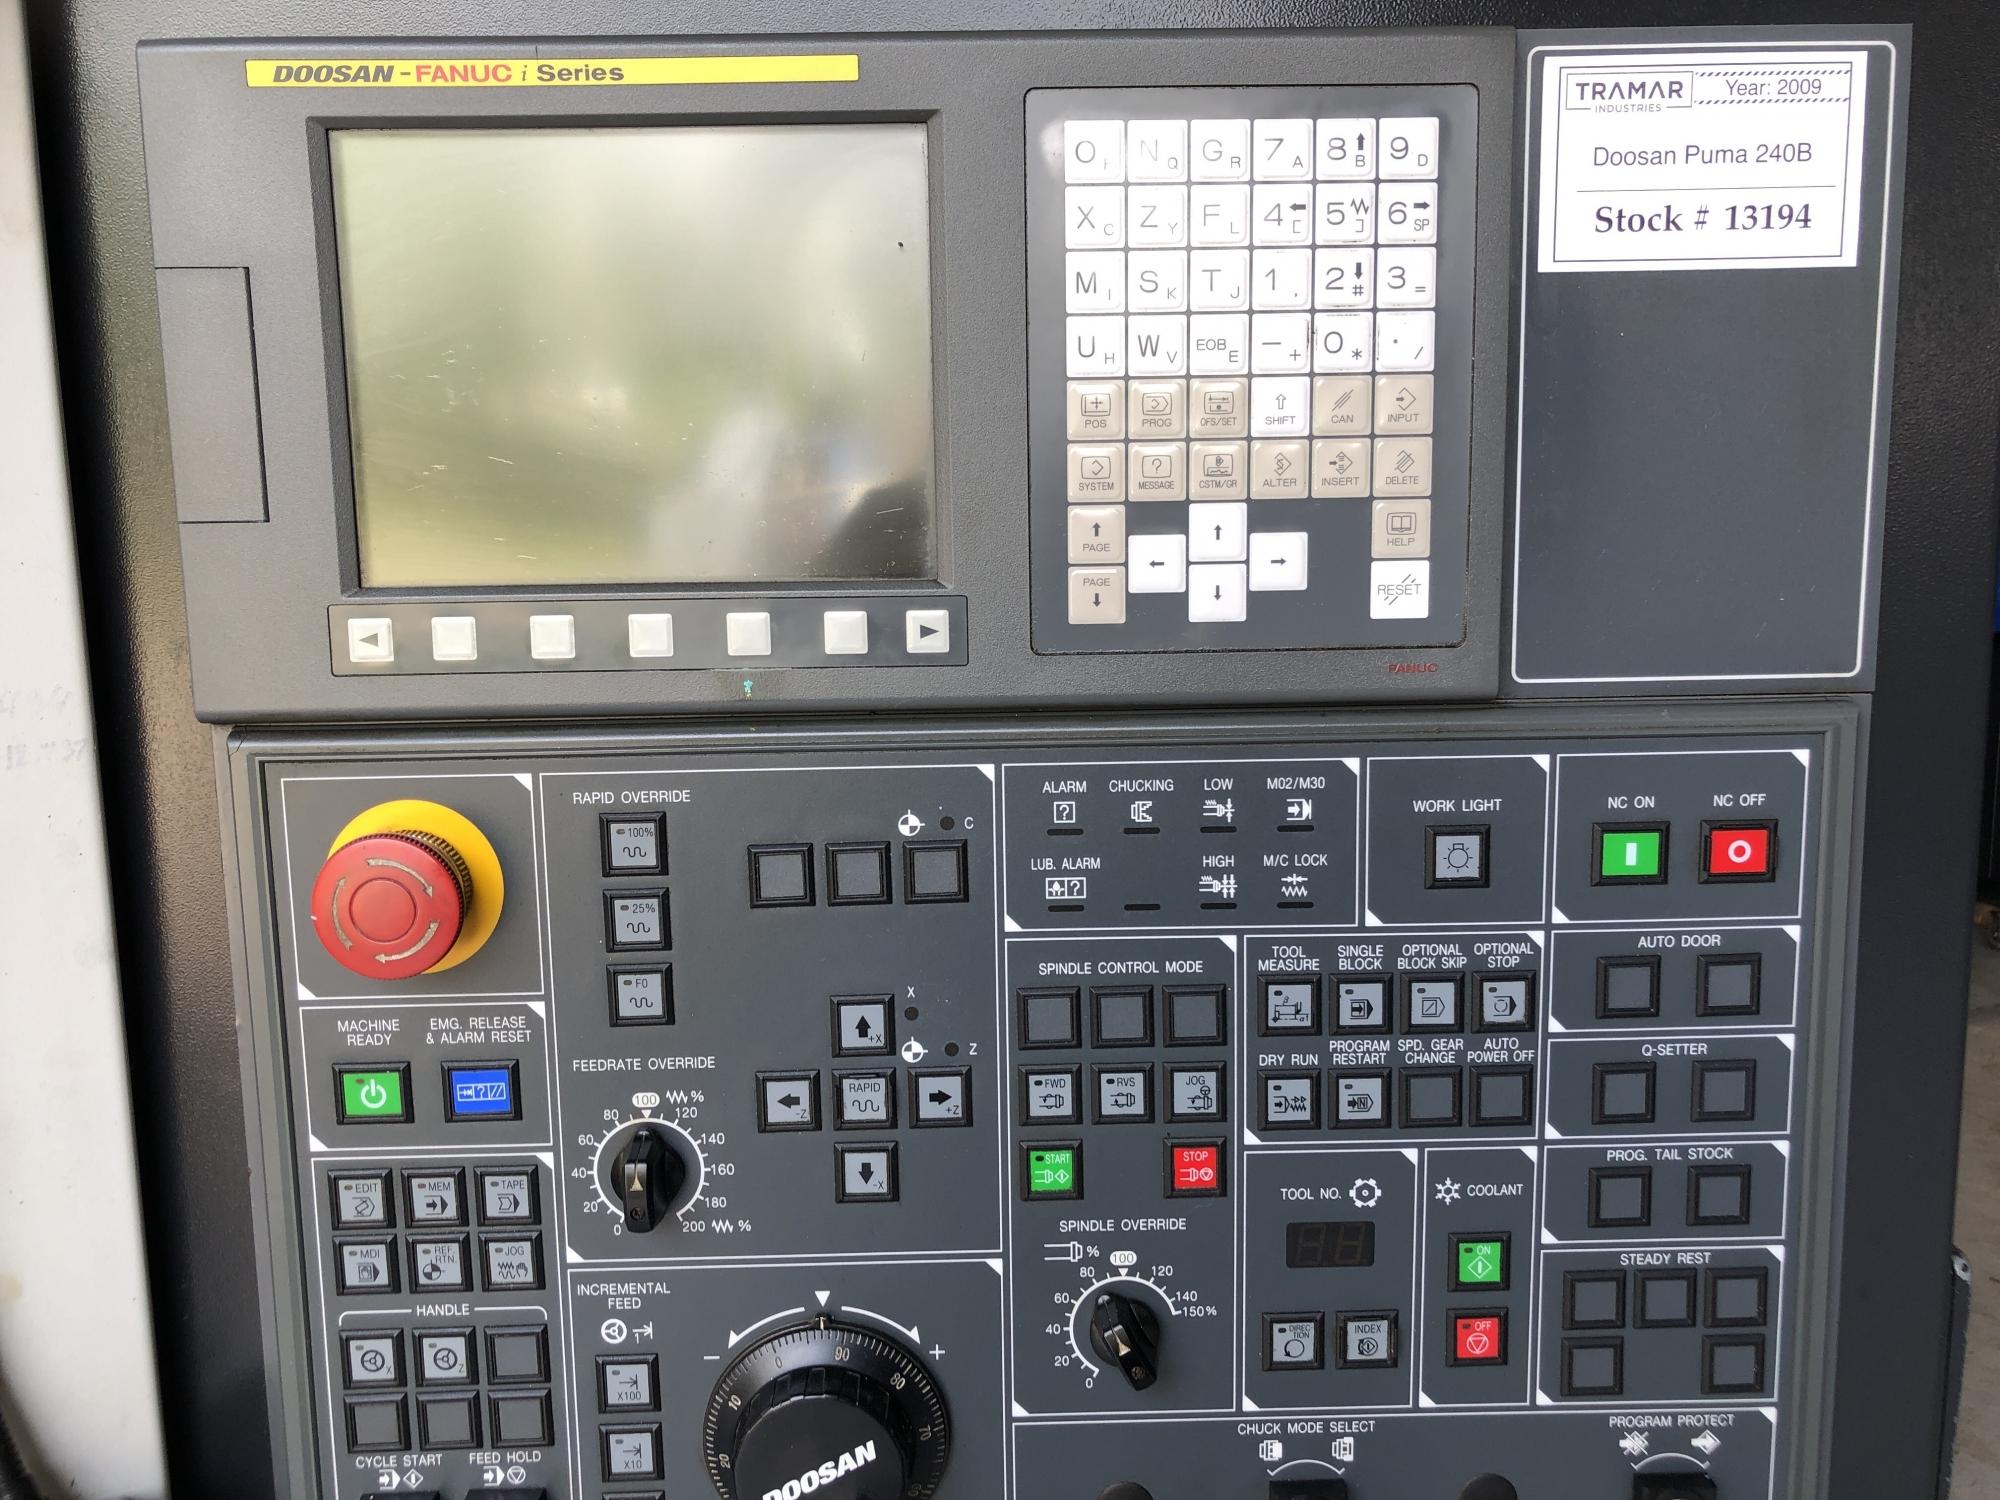 2009 Doosan Puma 240B - CNC Horizontal Lathe